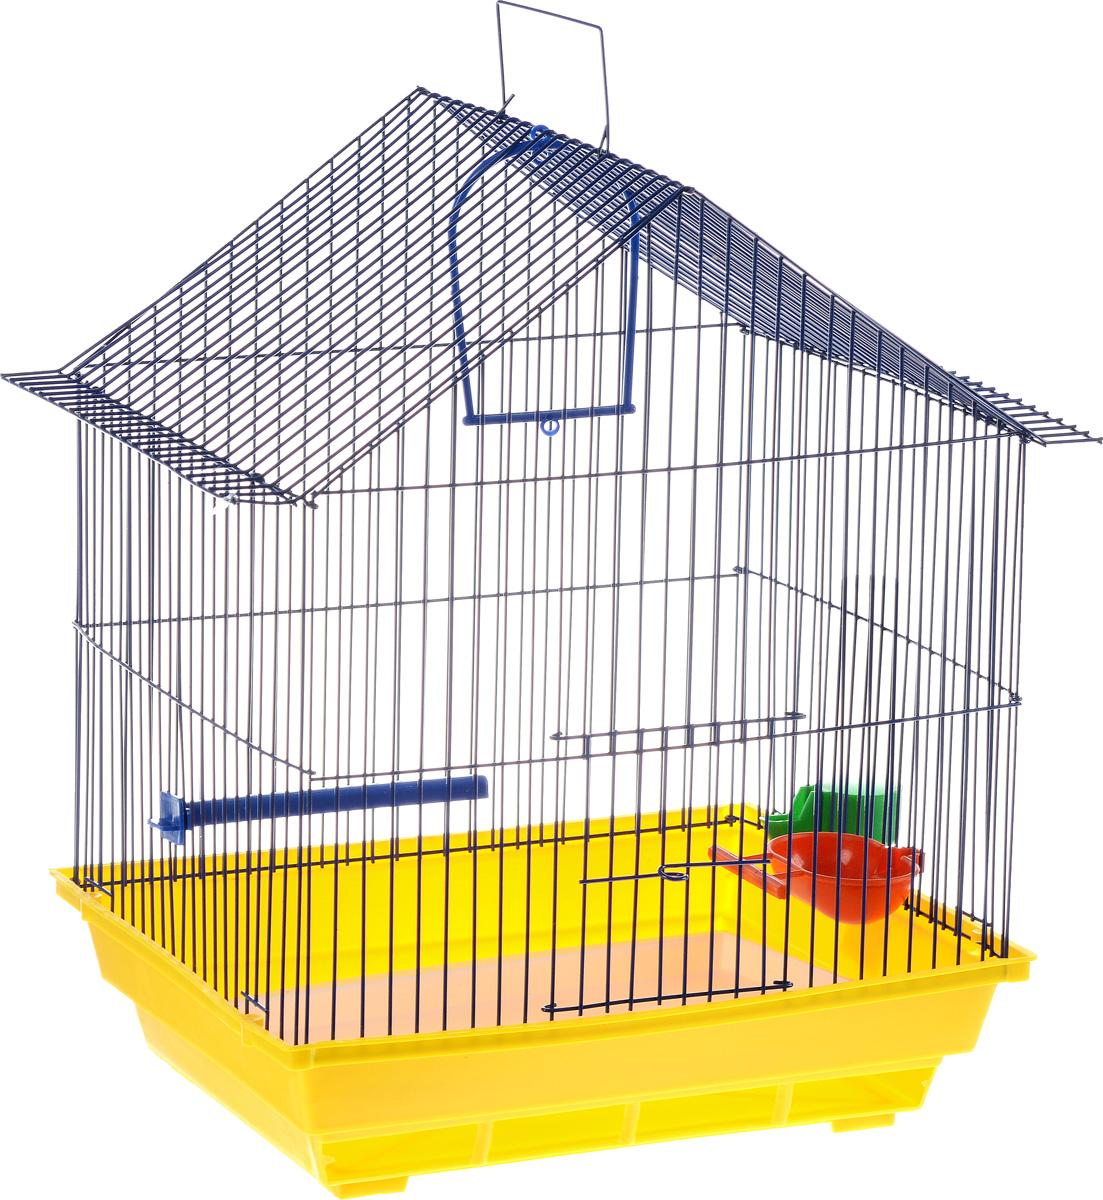 Клетка для птиц  ЗооМарк , цвет: желтый поддон, синяя решетка, 39 х 28 х 42 см